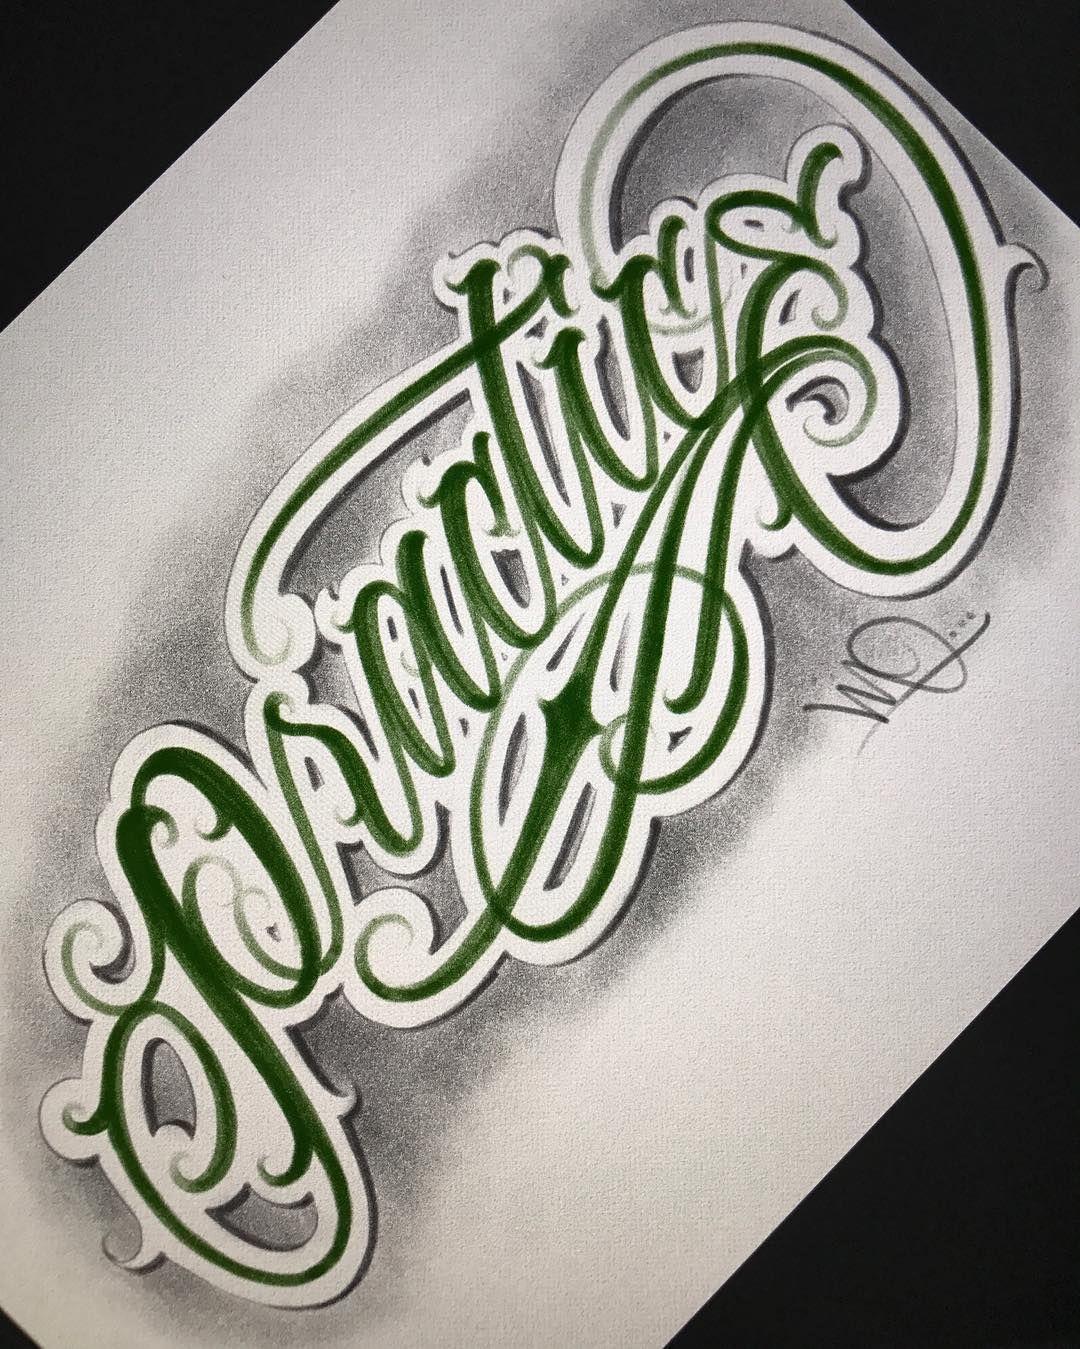 No Photo Description Available Cursive Tattoos Graffiti Alphabet Wildstyle Graffiti Designs